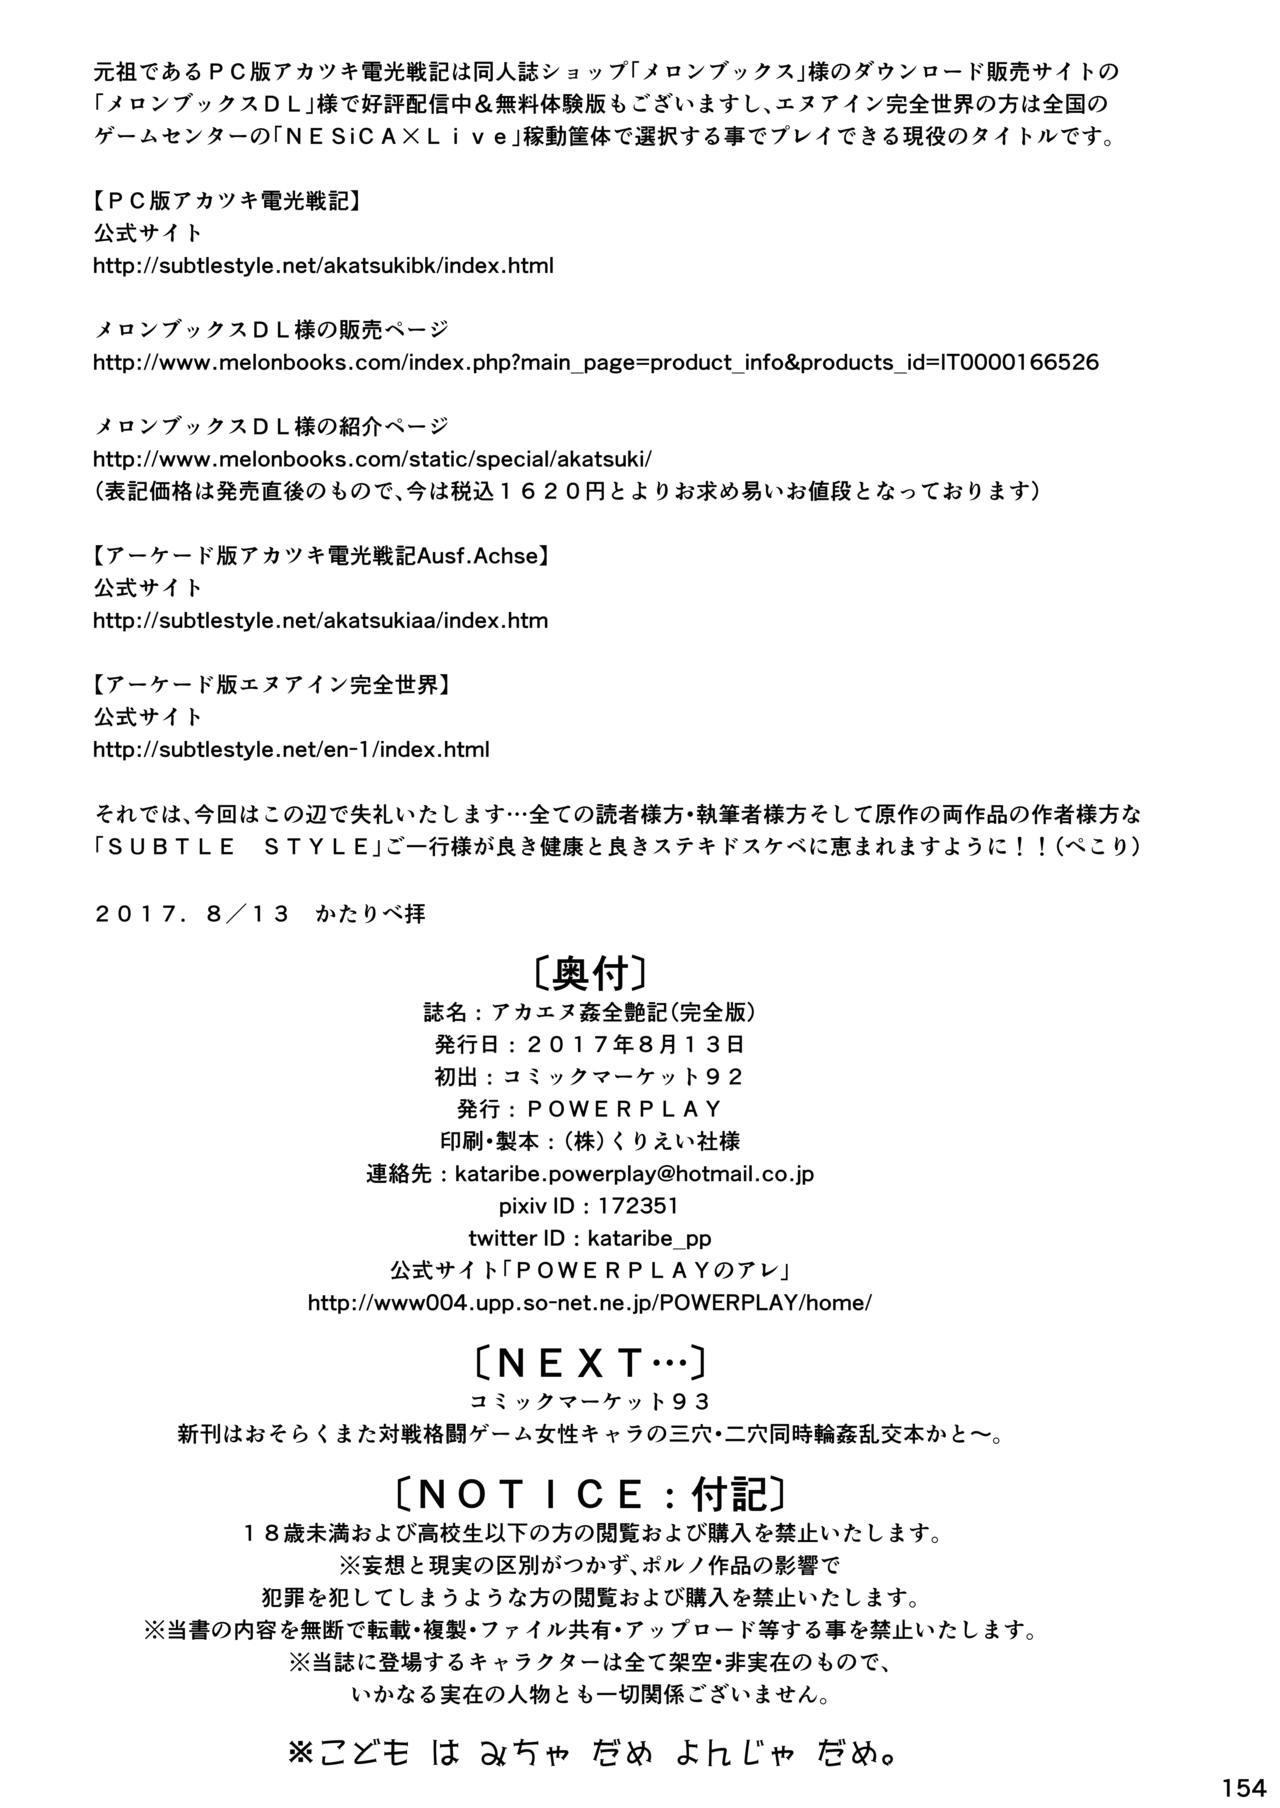 Akatsuki Blitzkampf & EN-1 Perfekt Welt Gangbang Anthology 153